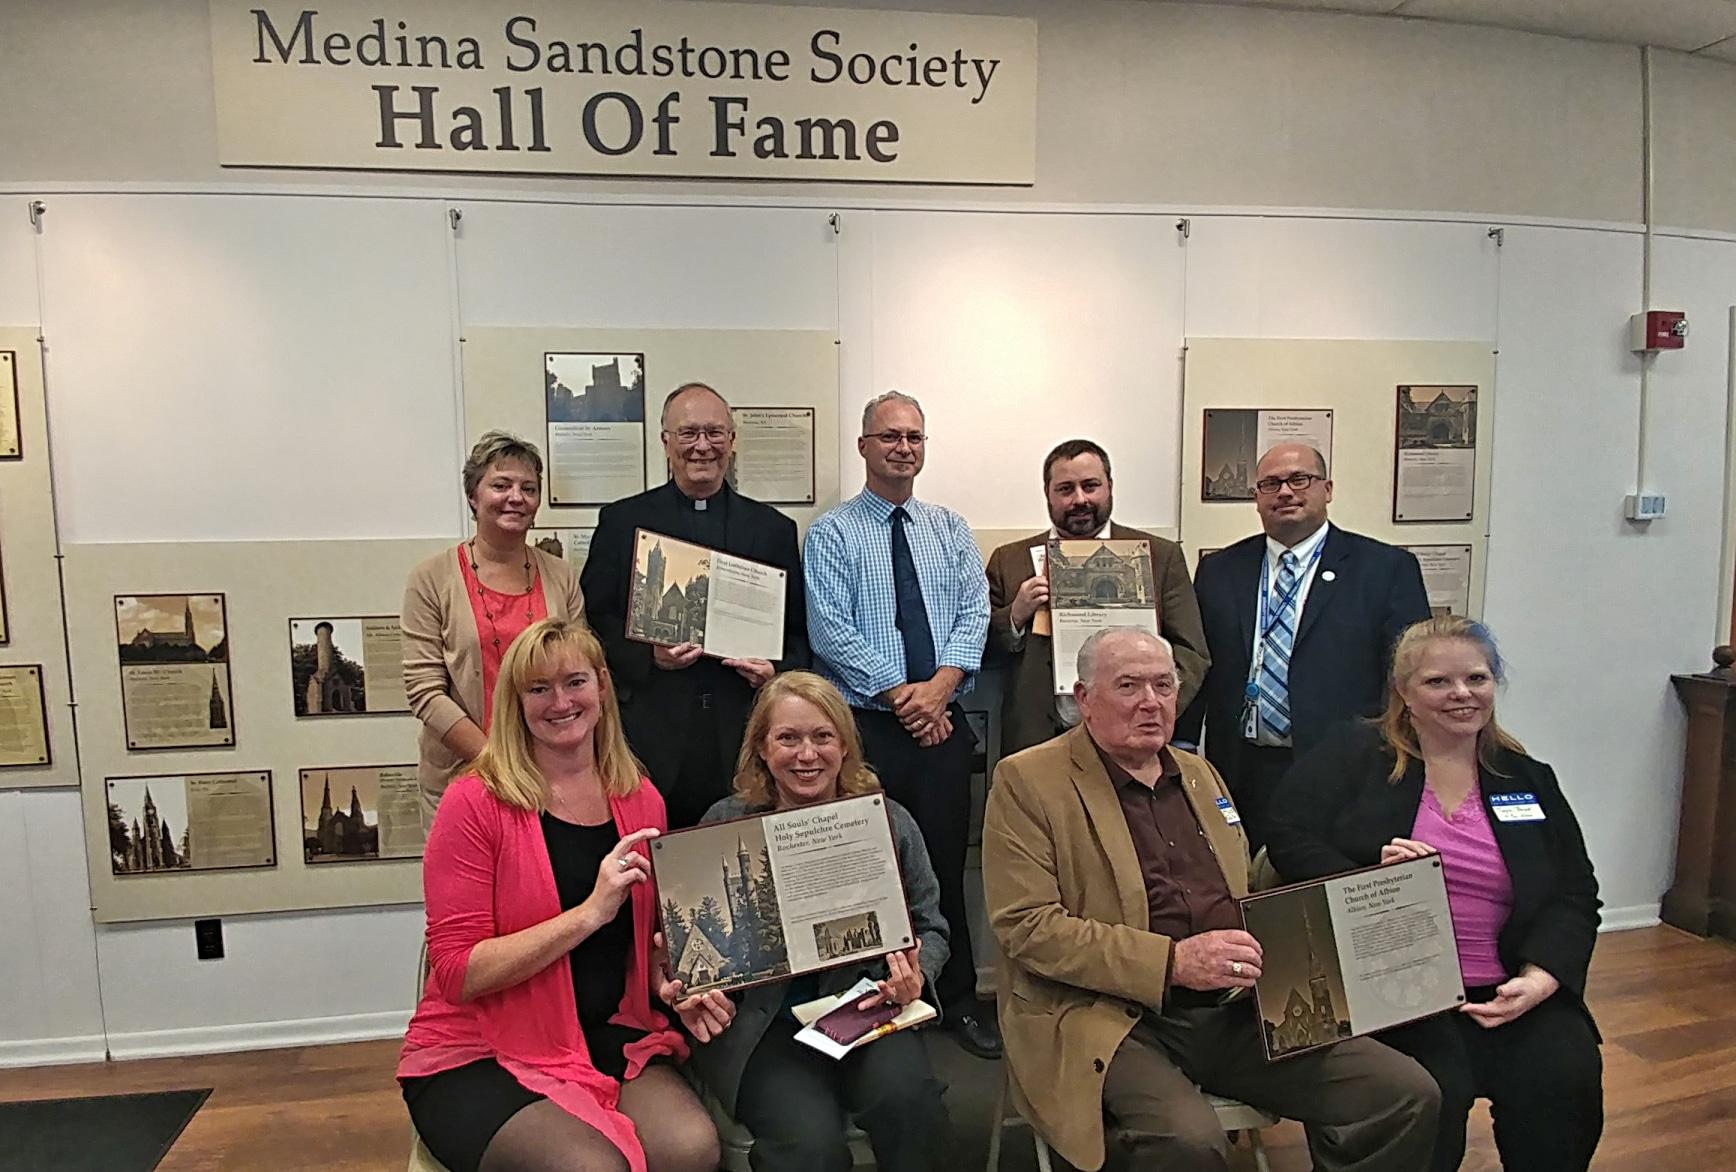 2017 sandstone hall of fame inductees medina sandstone society